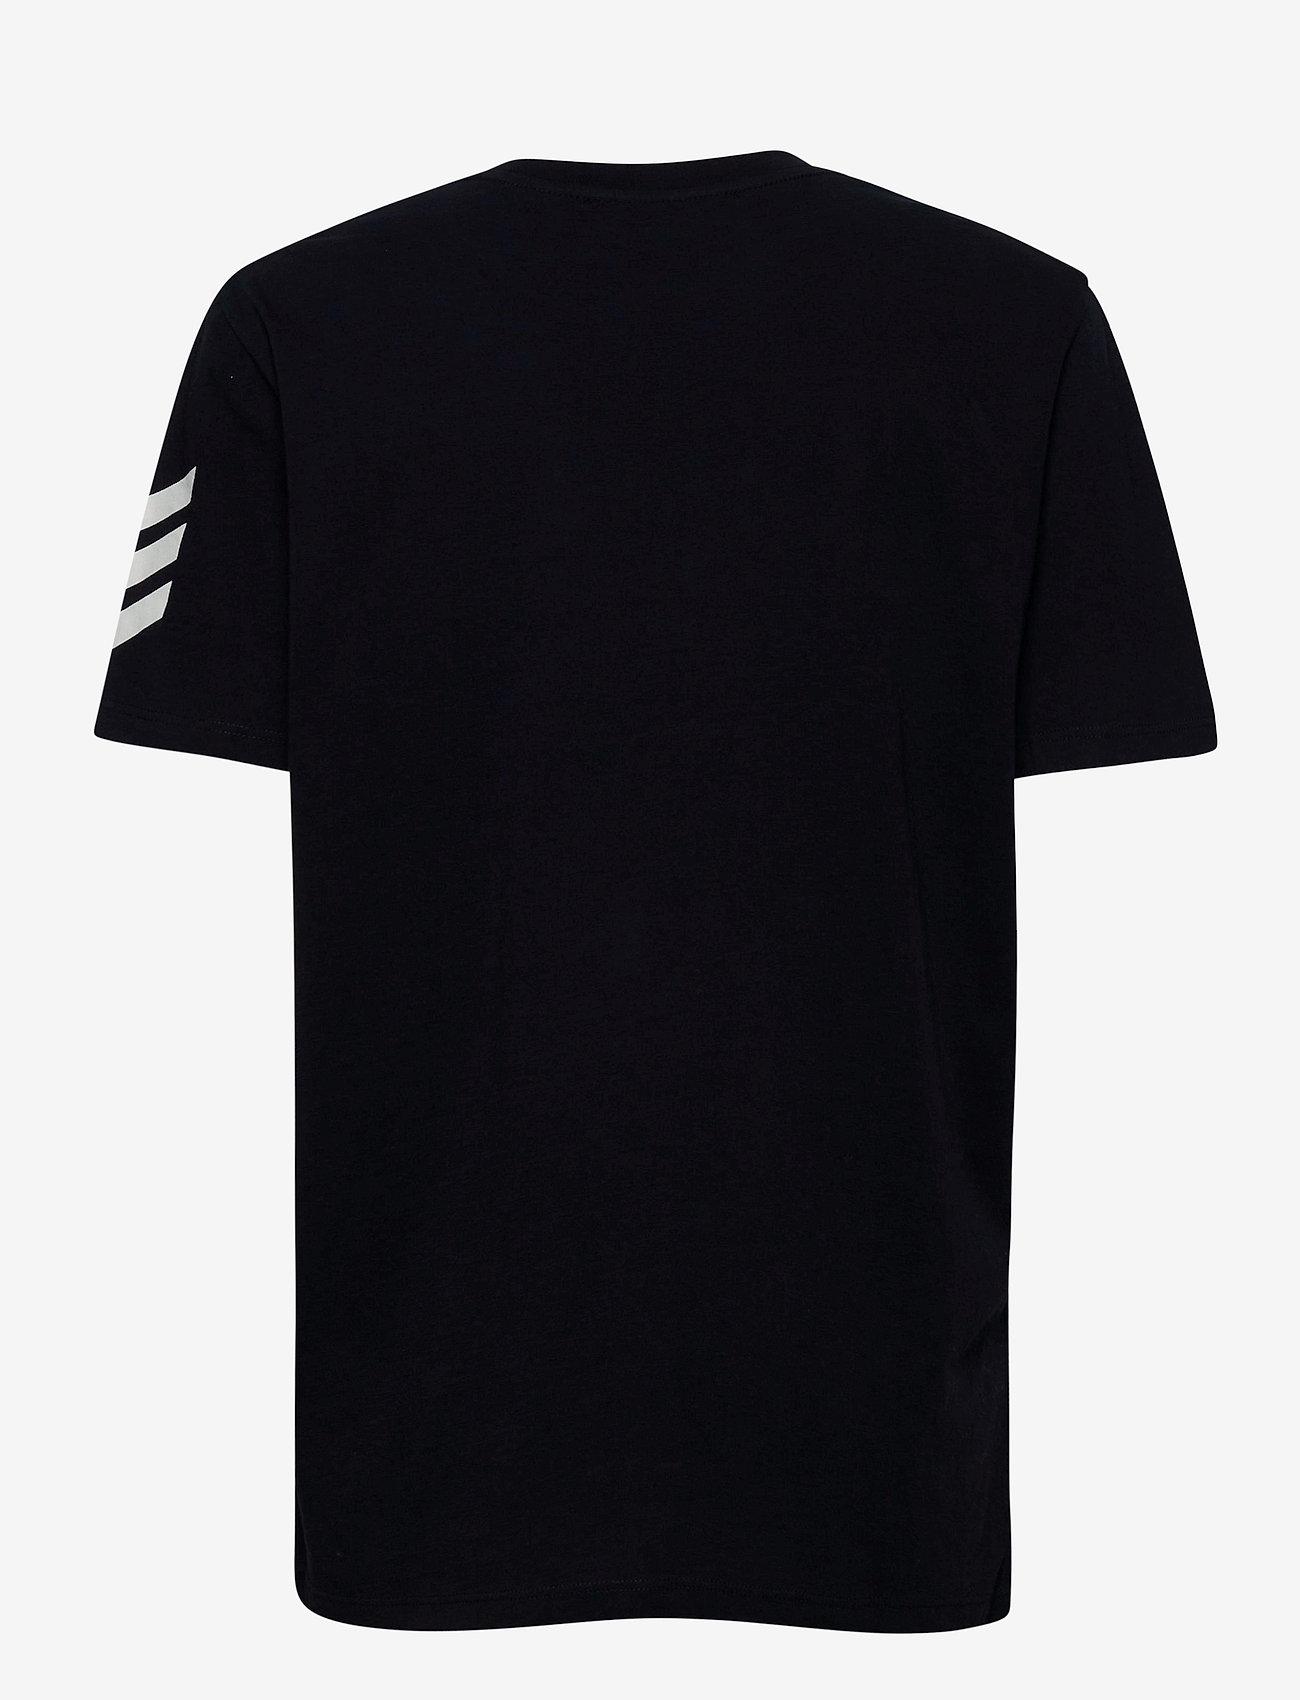 Zadig & Voltaire - TOMMY HC ARROW TEE-SHIRT PRINT ARROW SLEEVE - basic t-shirts - navy blue - 1